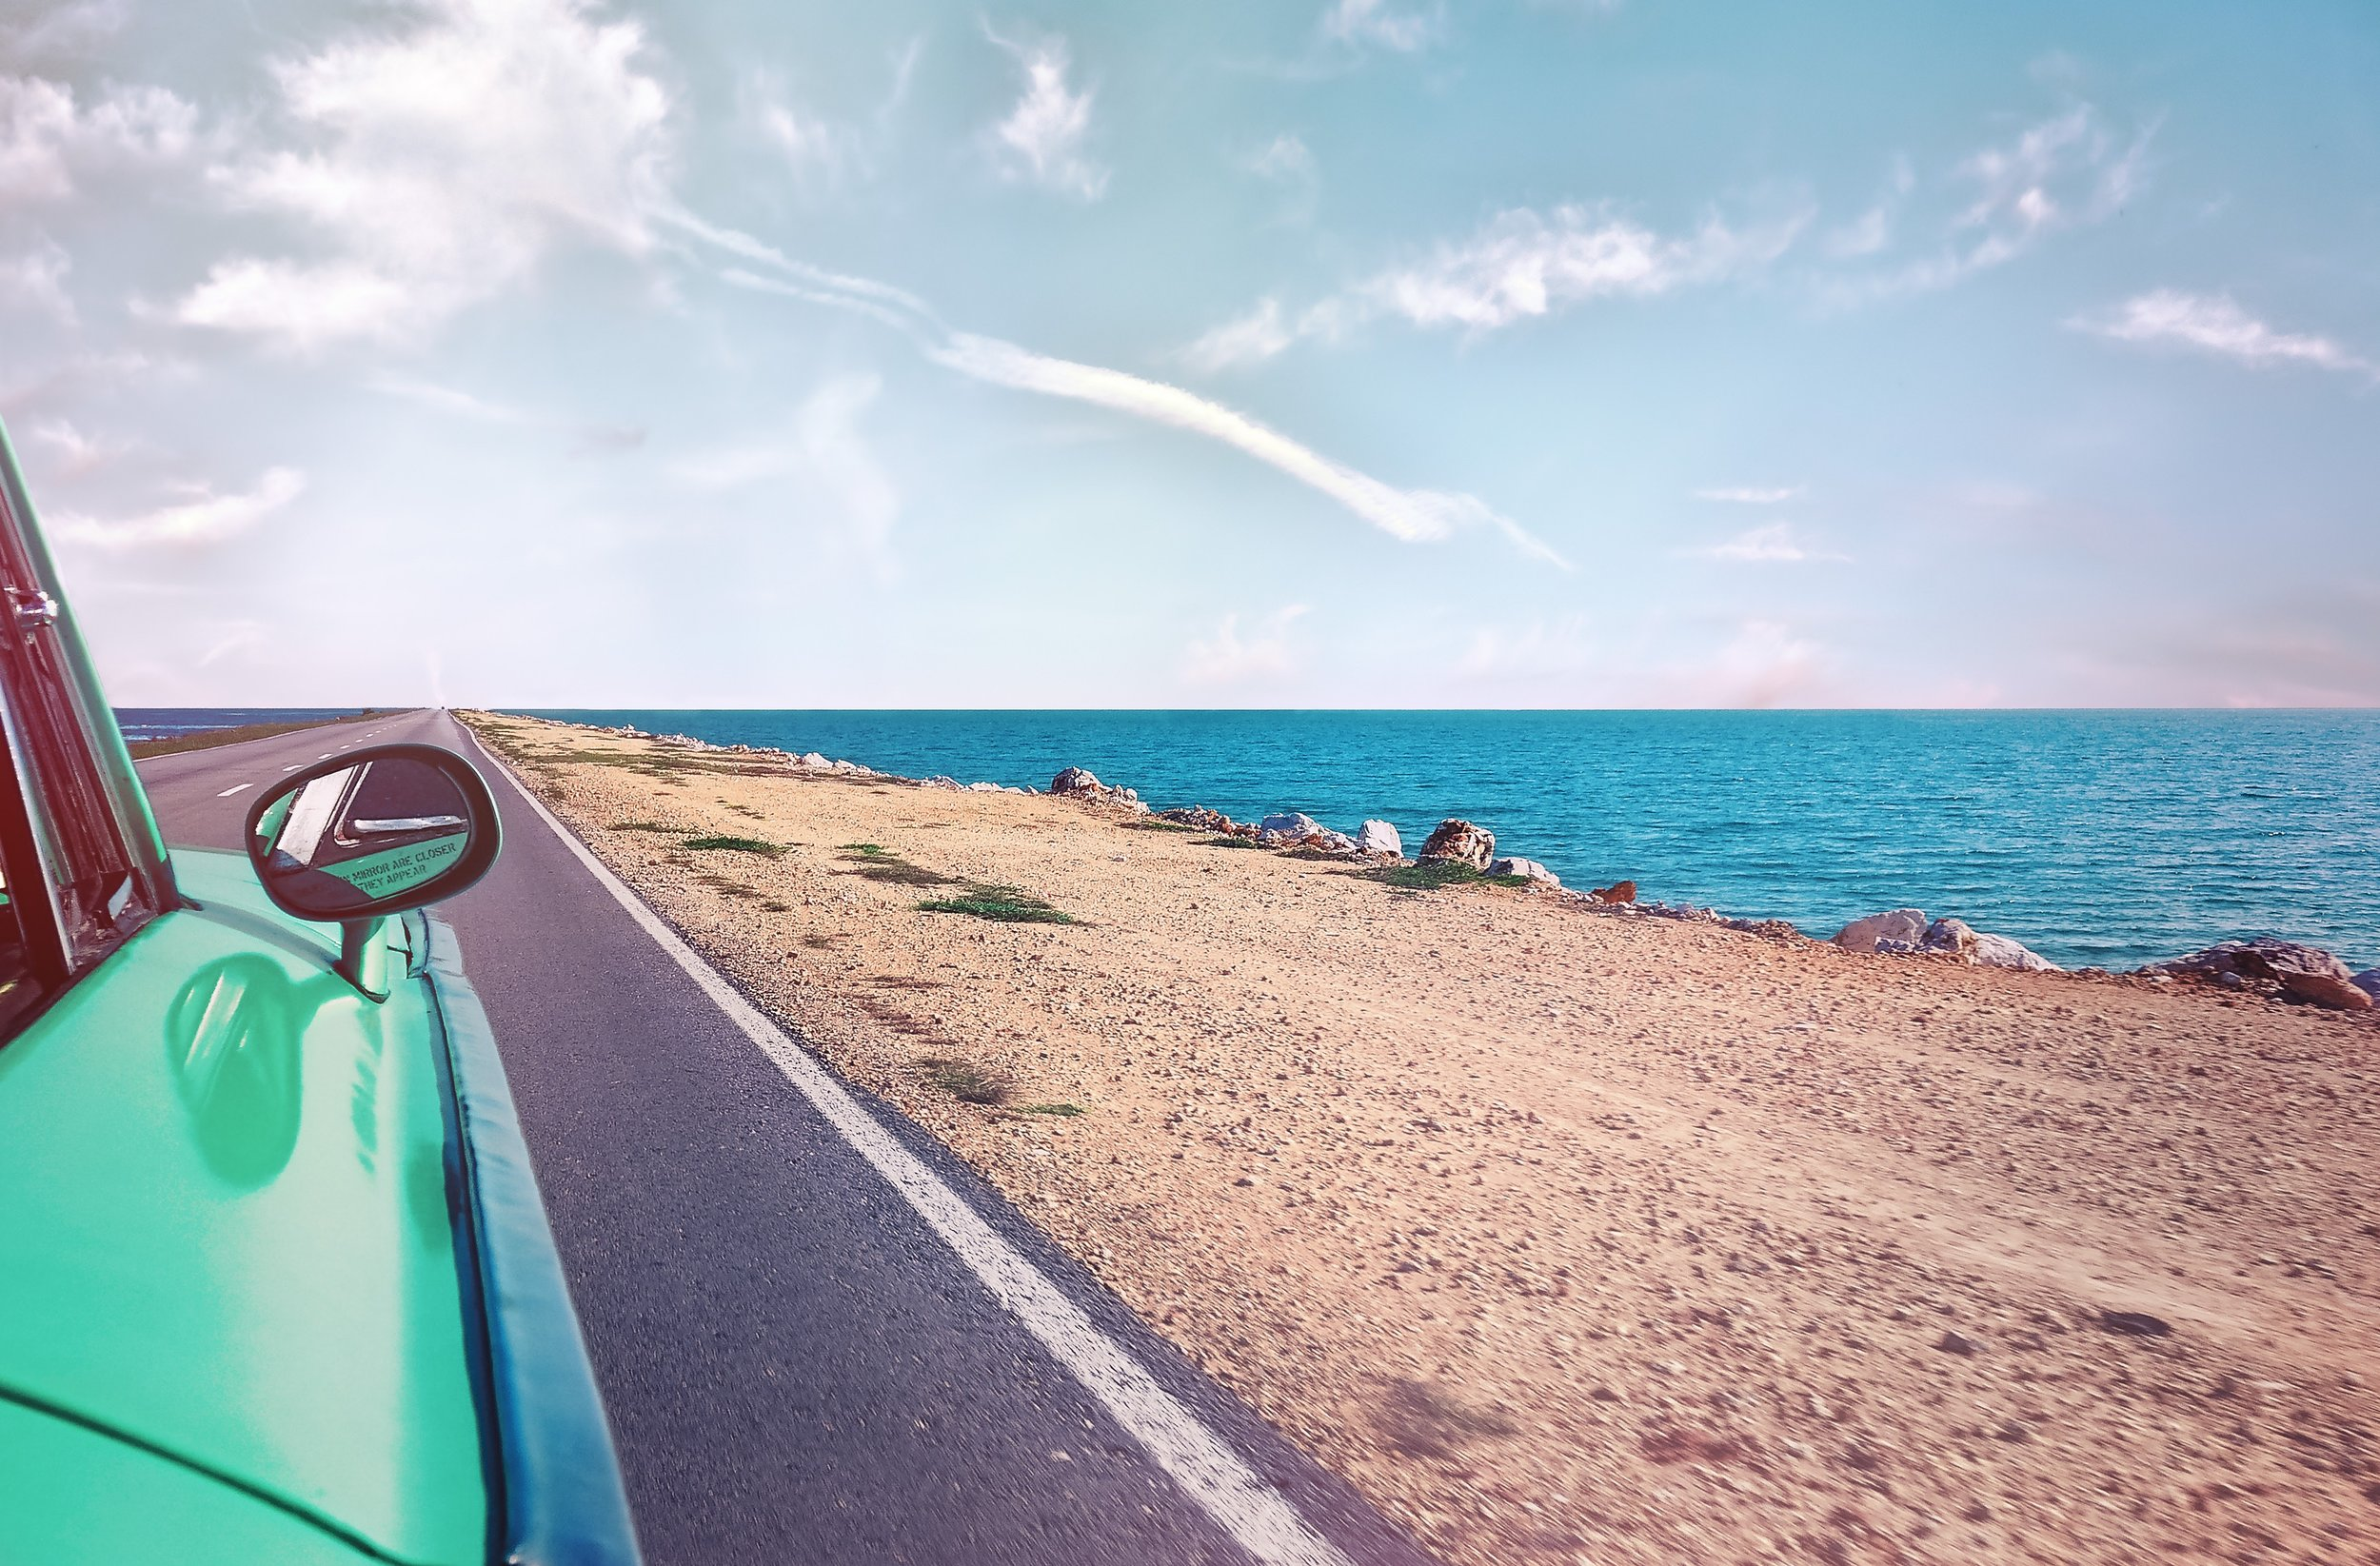 asphalt-automobile-beach-1118448.jpg